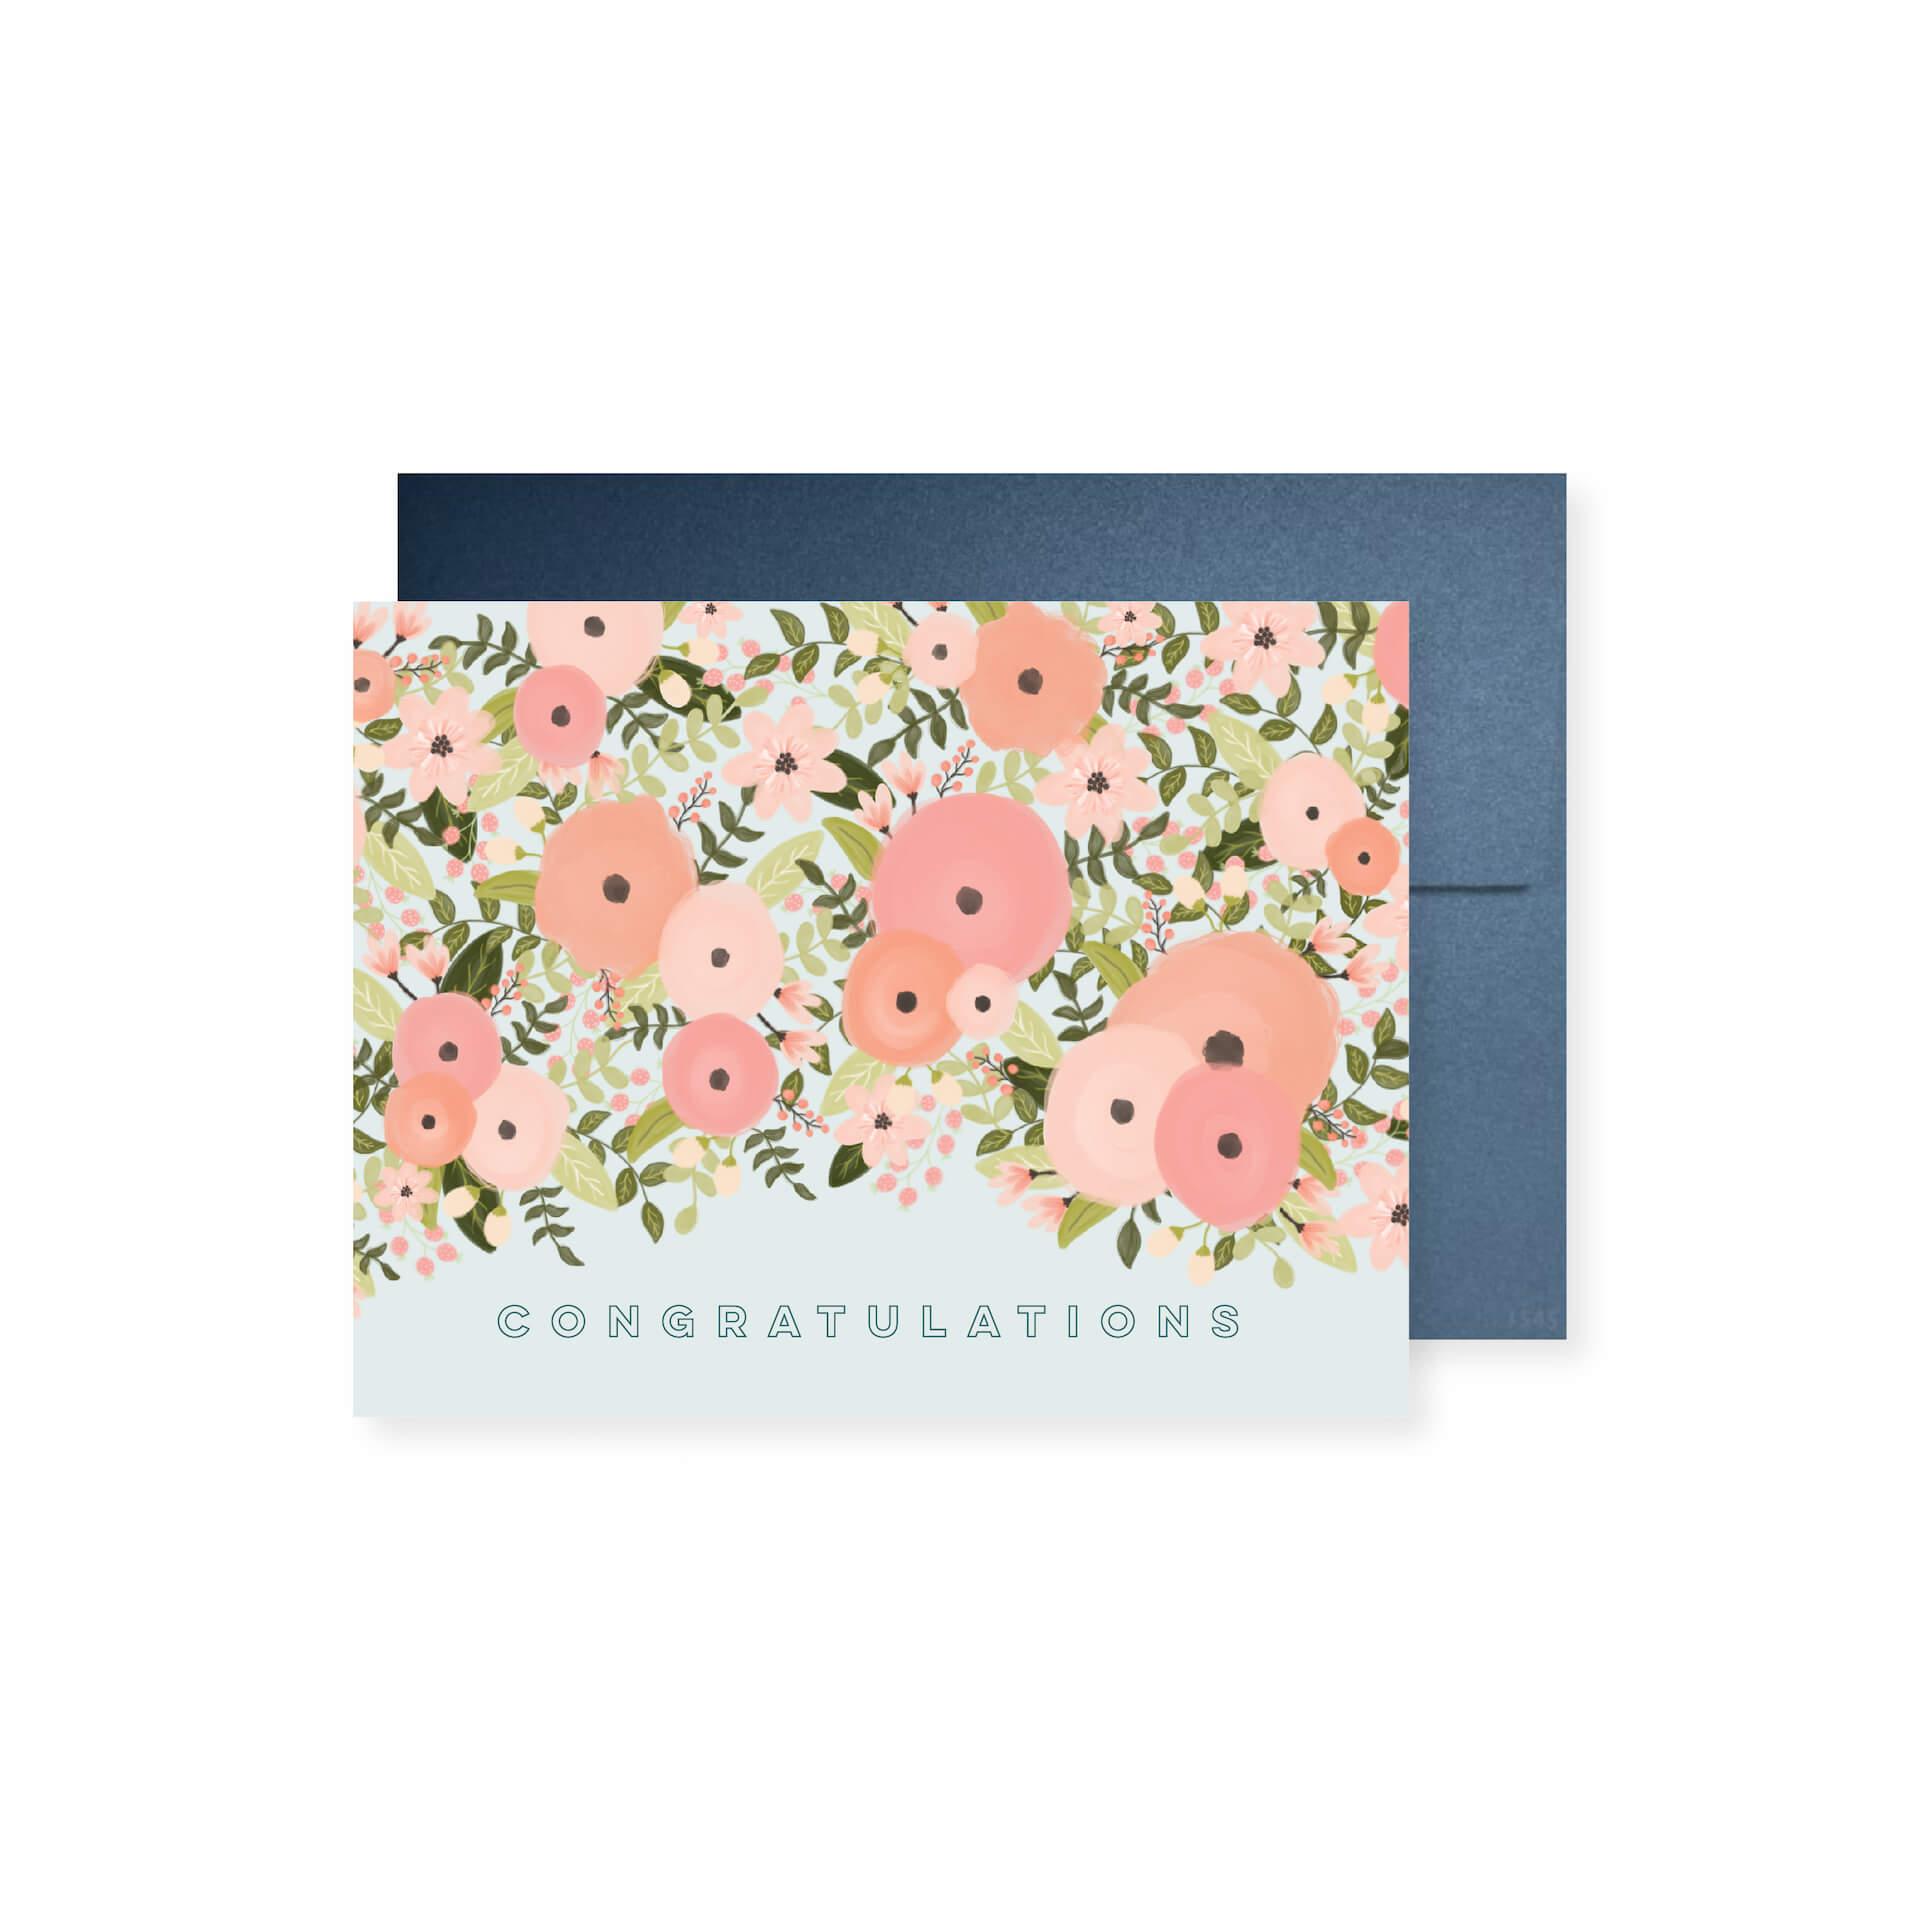 Peachy Mint Congrats Card-01.jpg